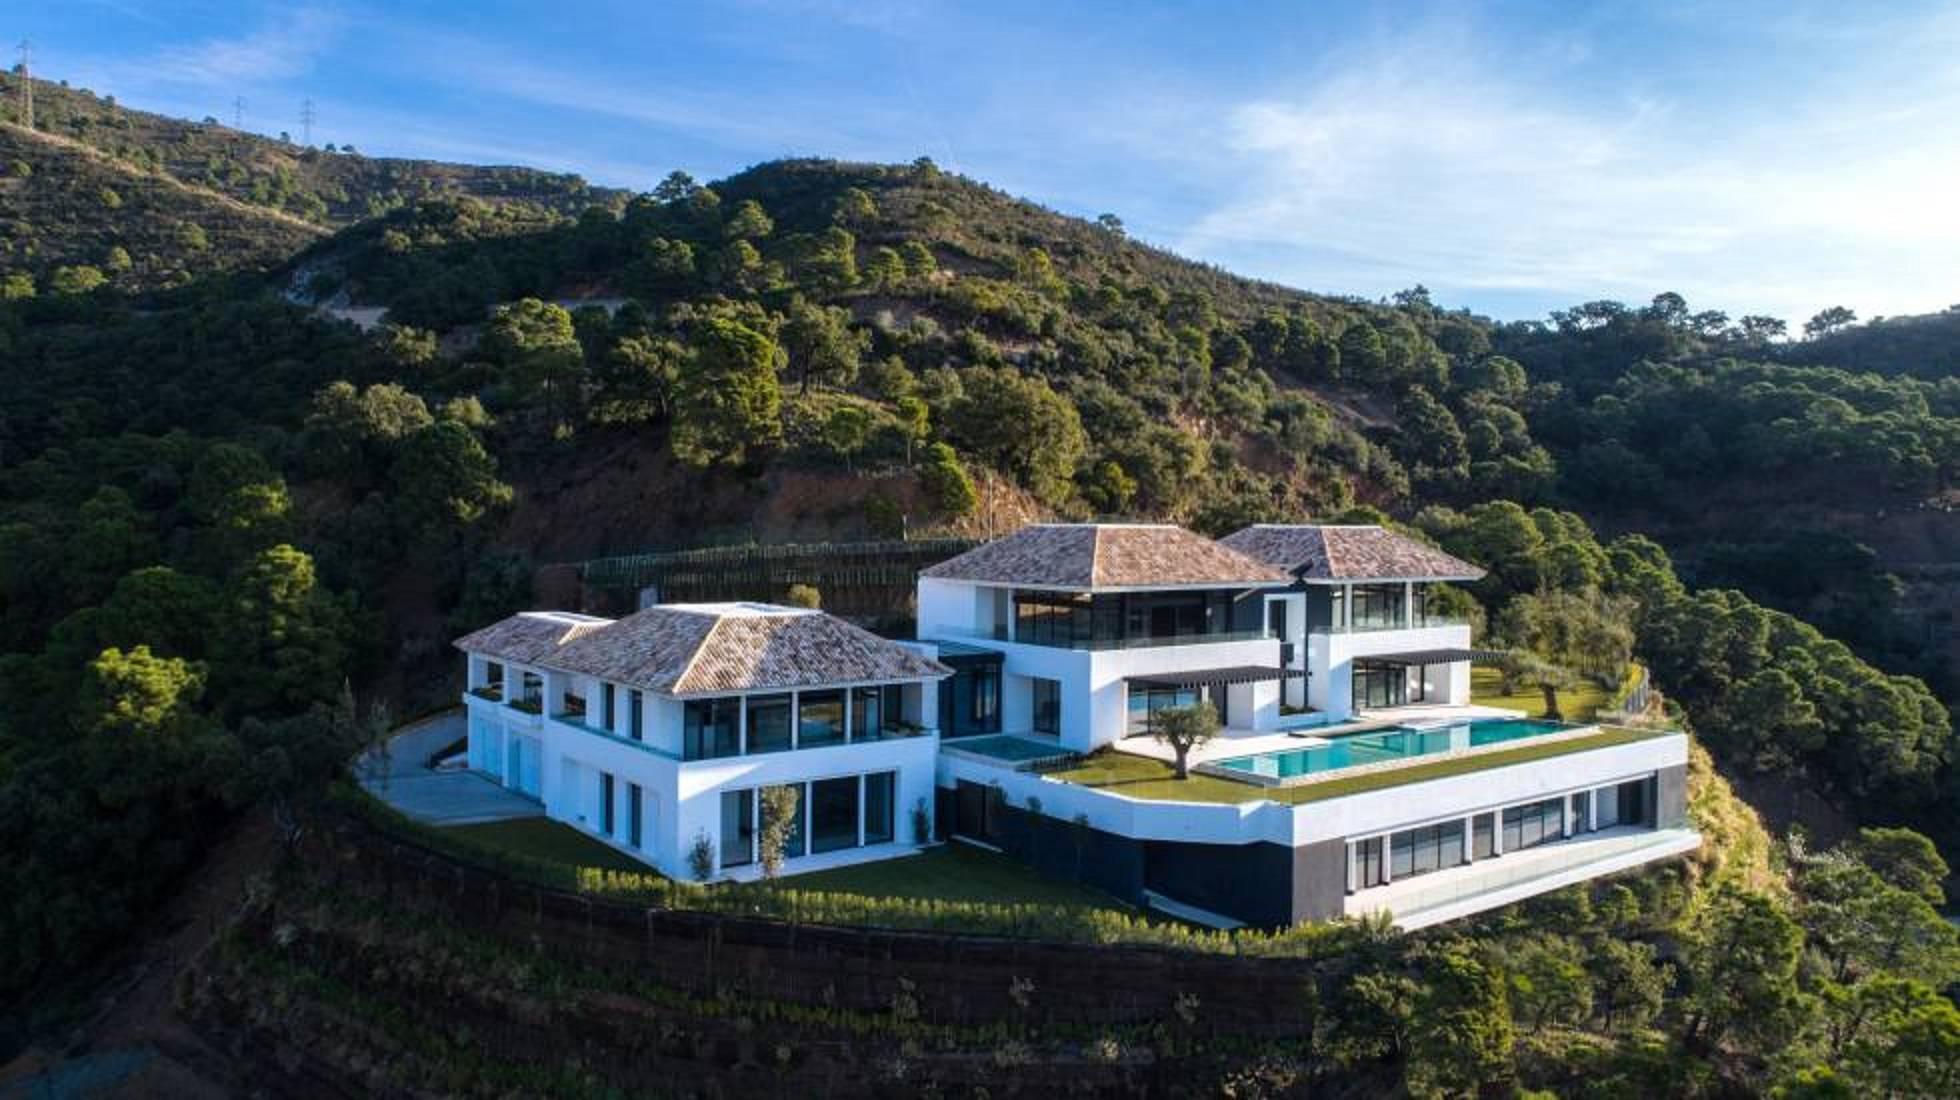 cristiano ronaldo house madeira